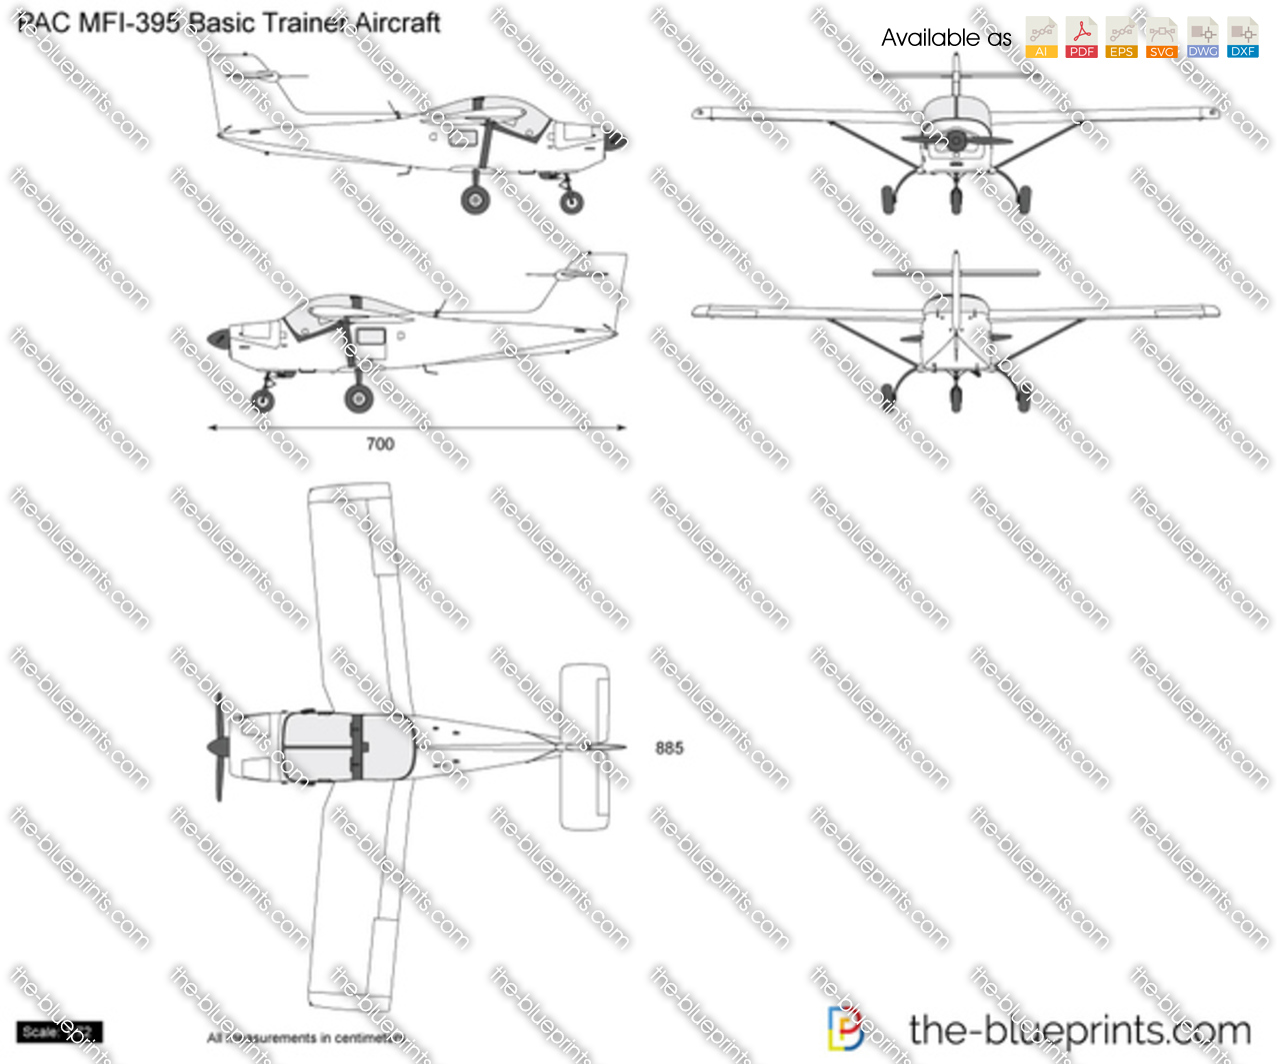 PAC MFI-395 Basic Trainer Aircraft